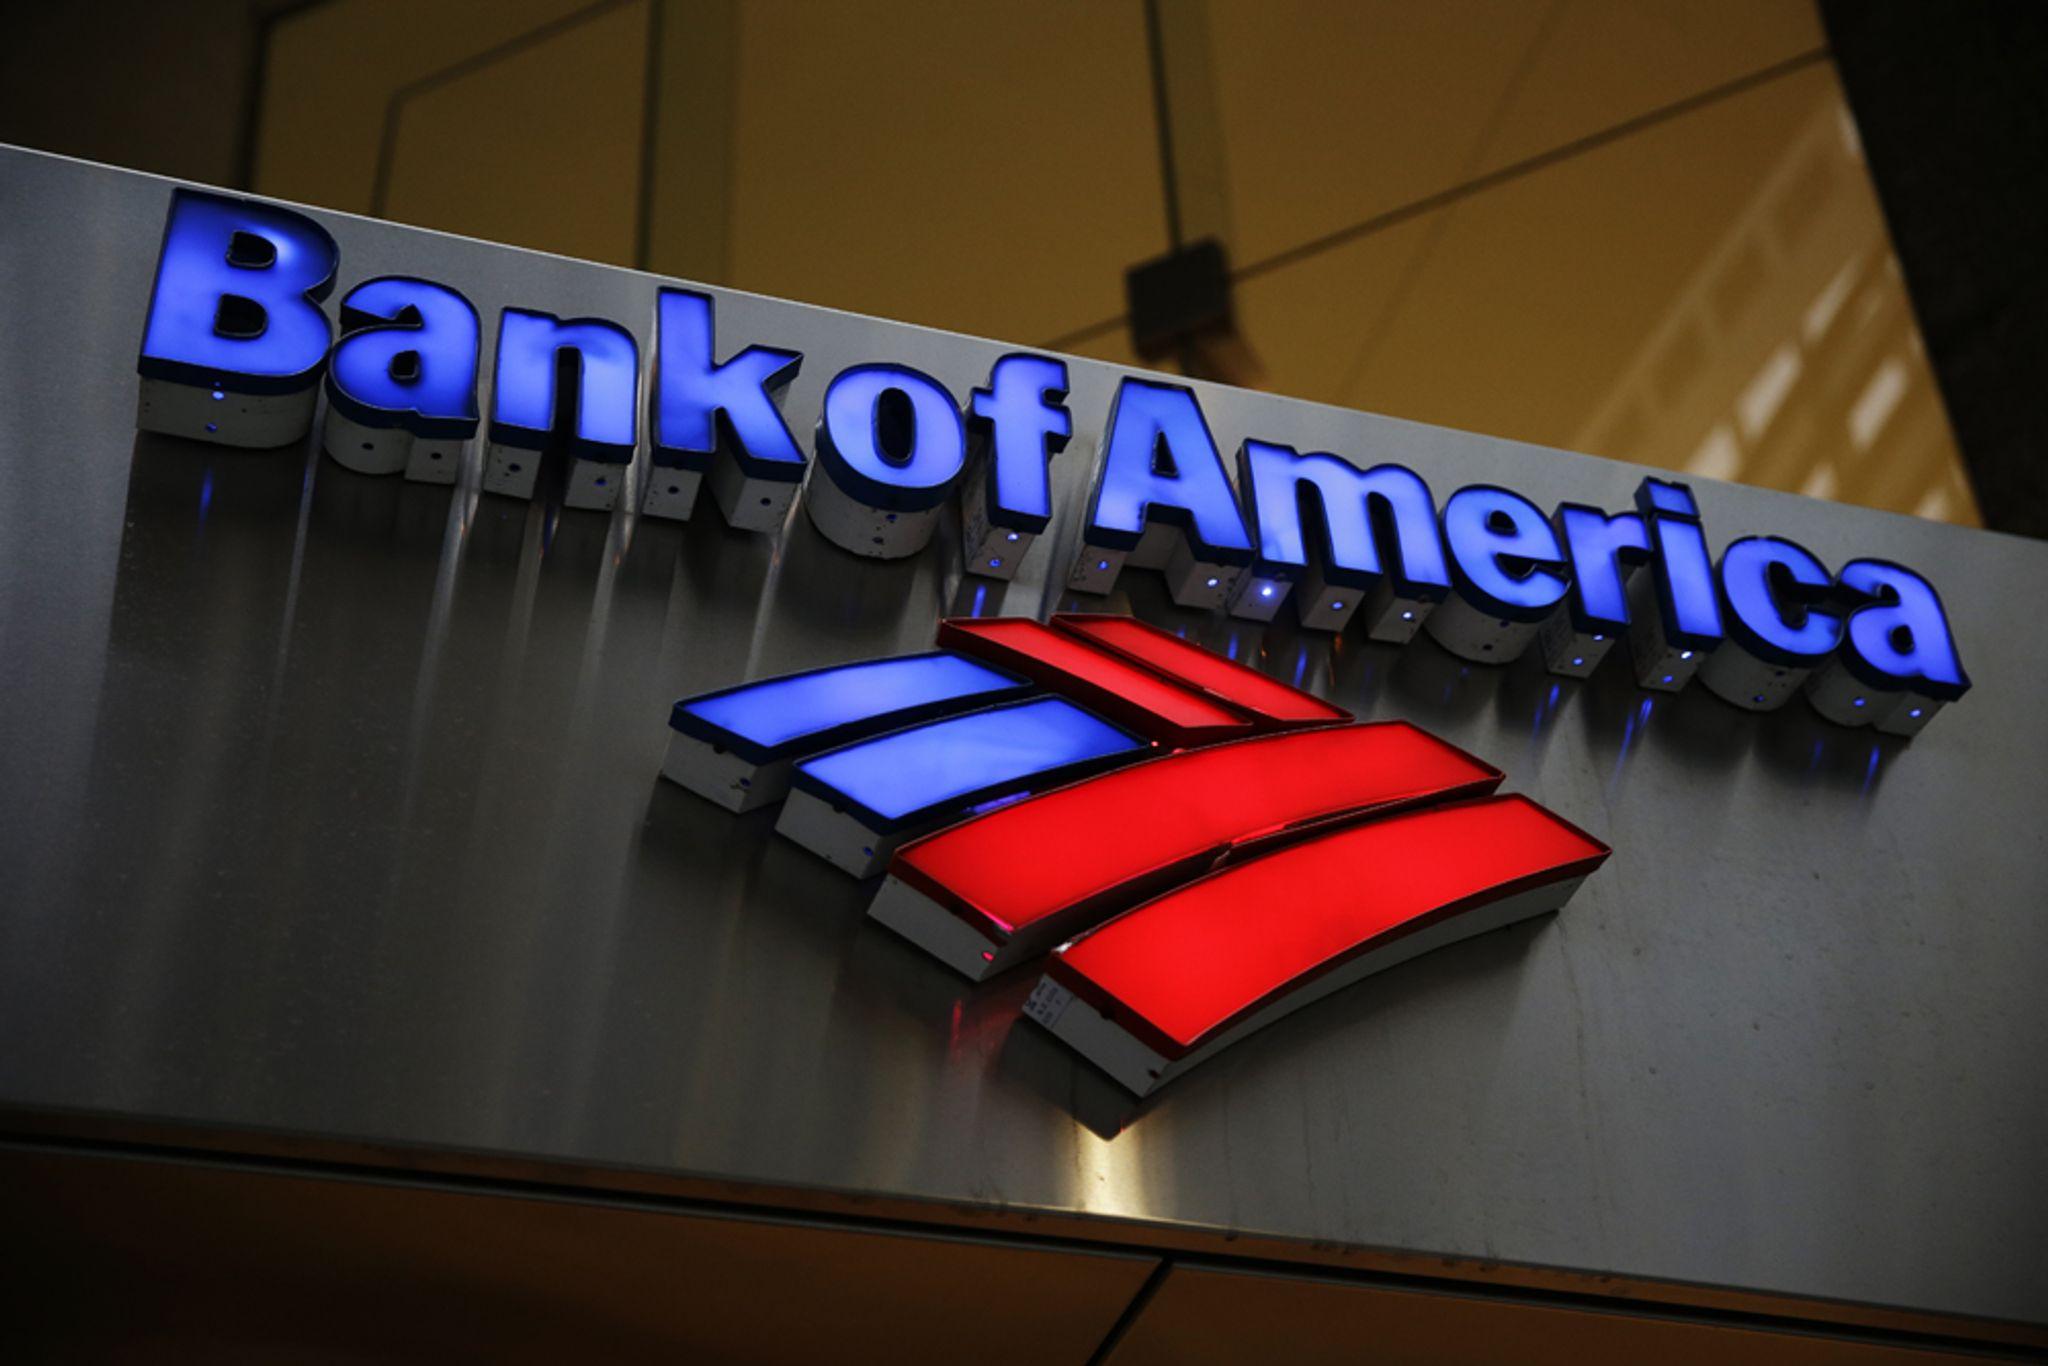 Banks, corporate America threatening Second Amendment, gun industry says